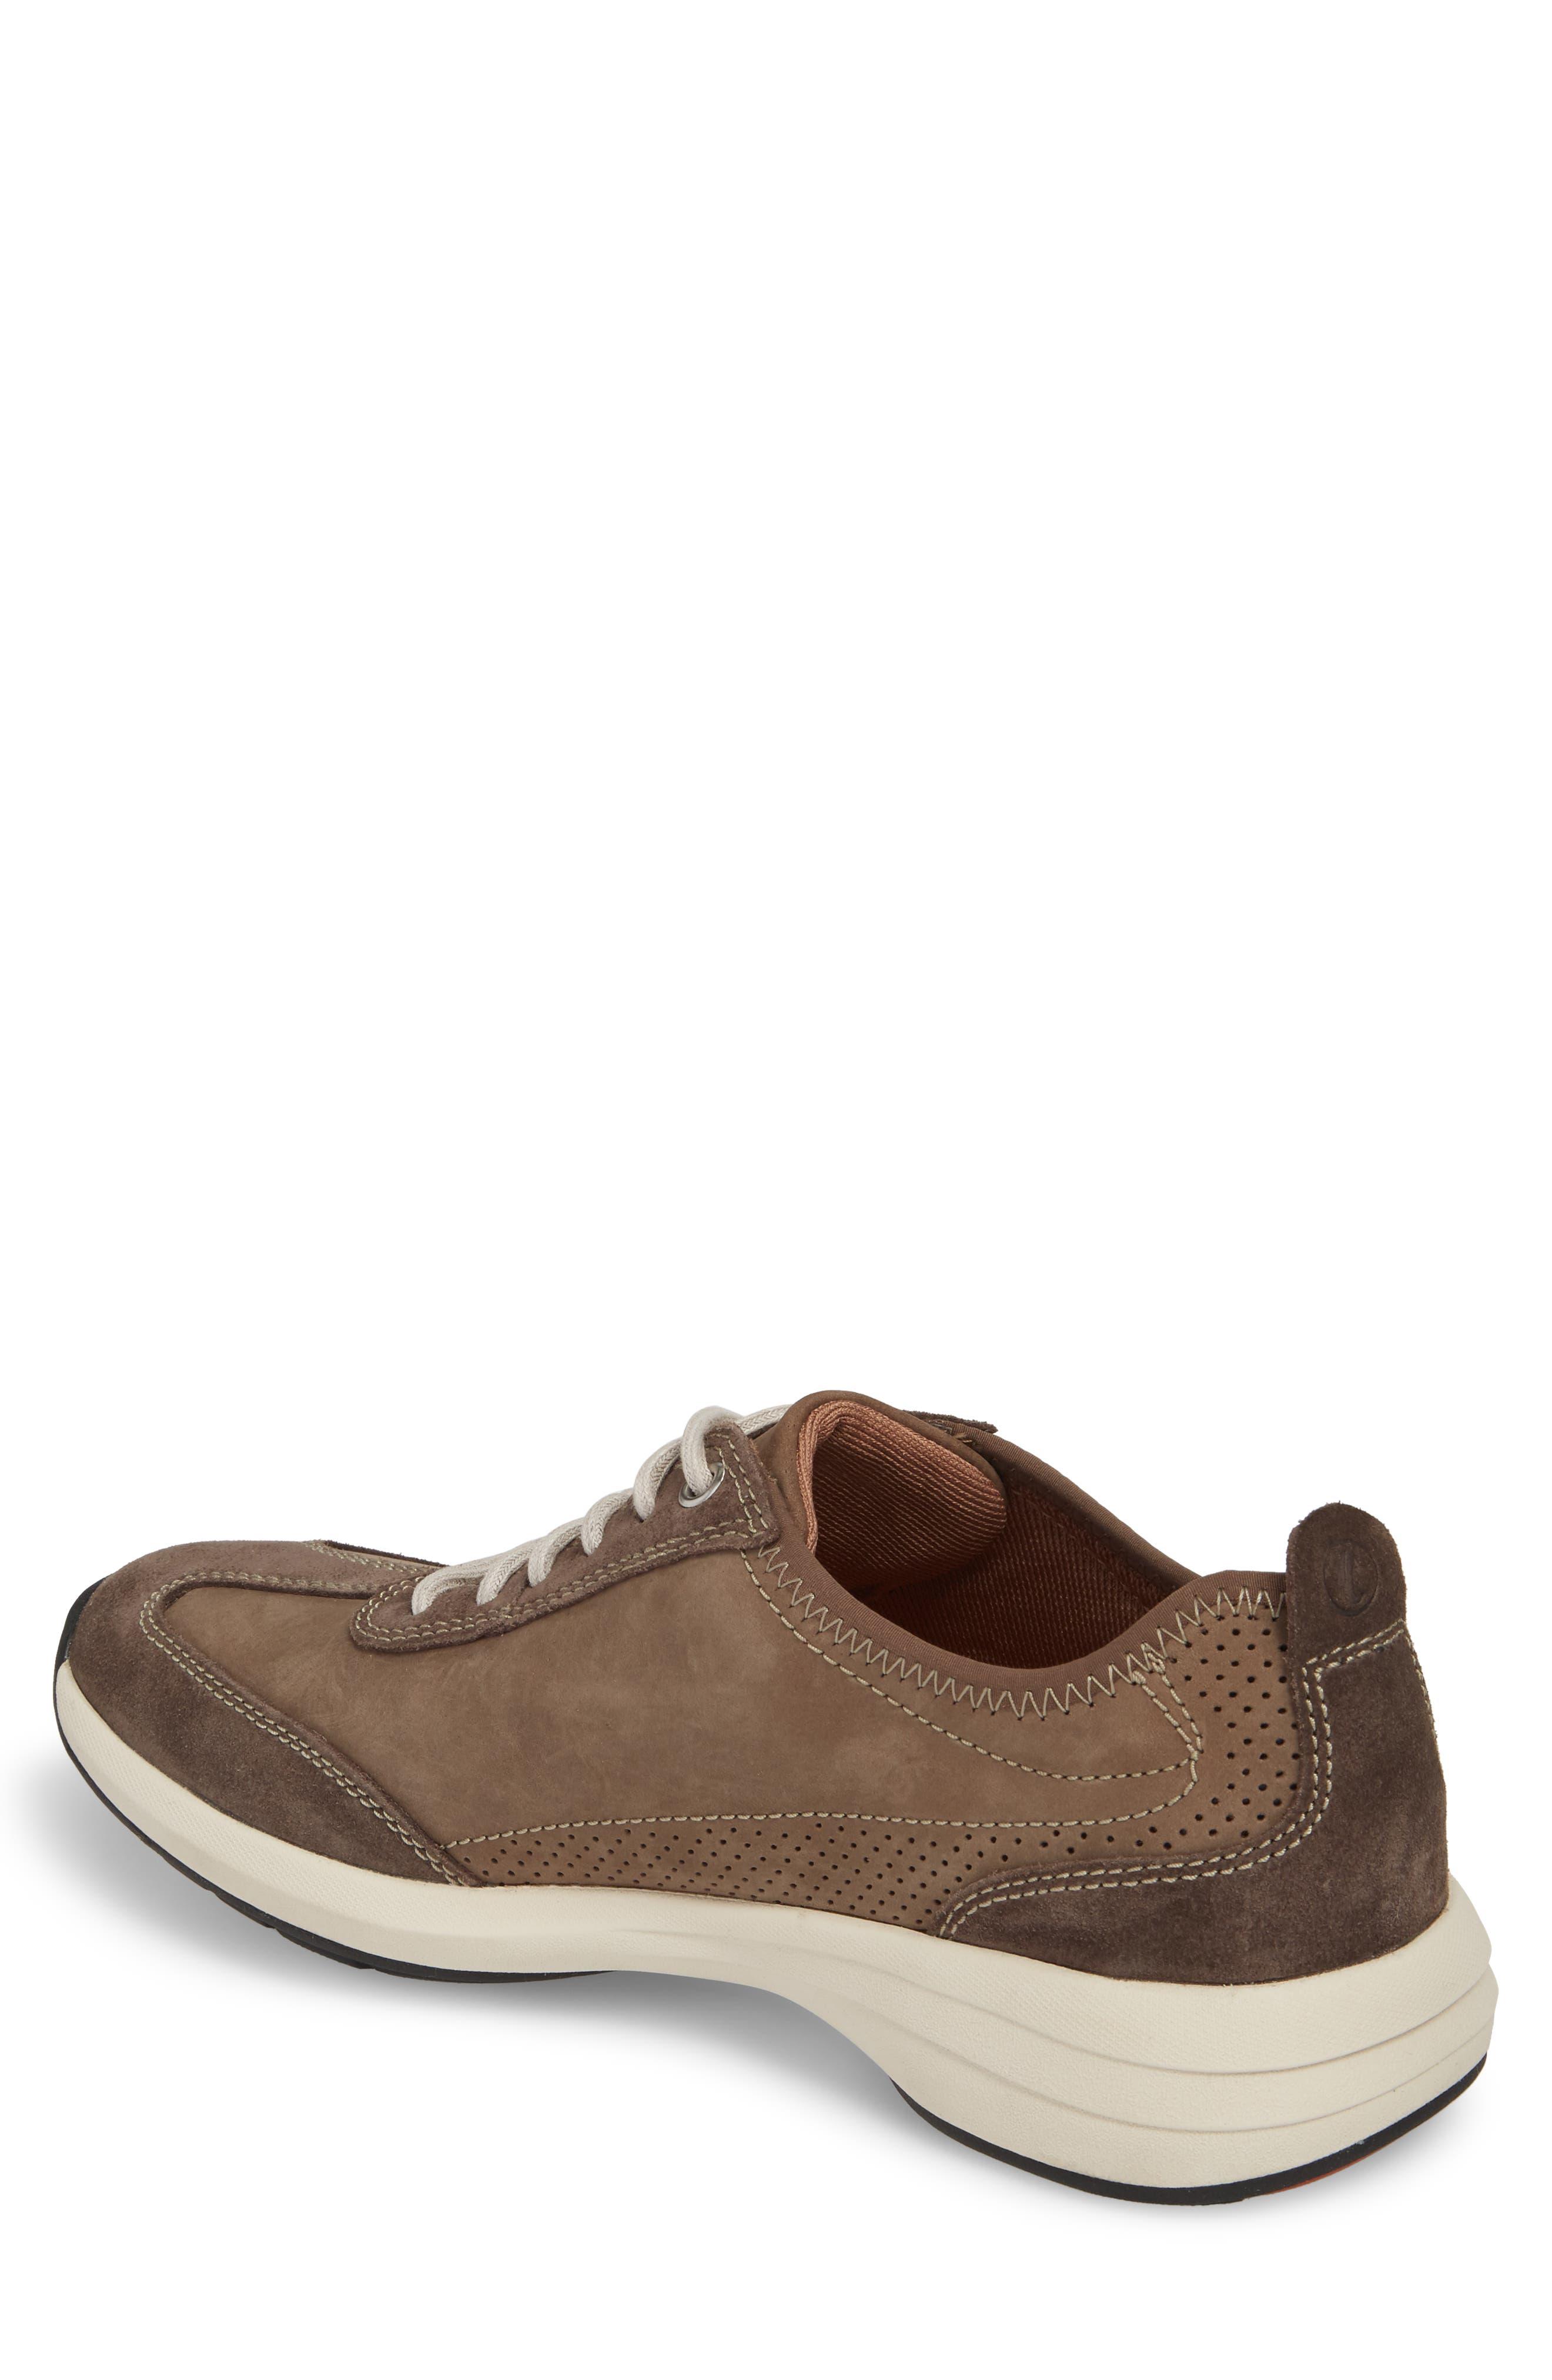 Clarks<sup>®</sup> Un Coast Low Top Sneaker,                             Alternate thumbnail 2, color,                             Taupe Nubuck